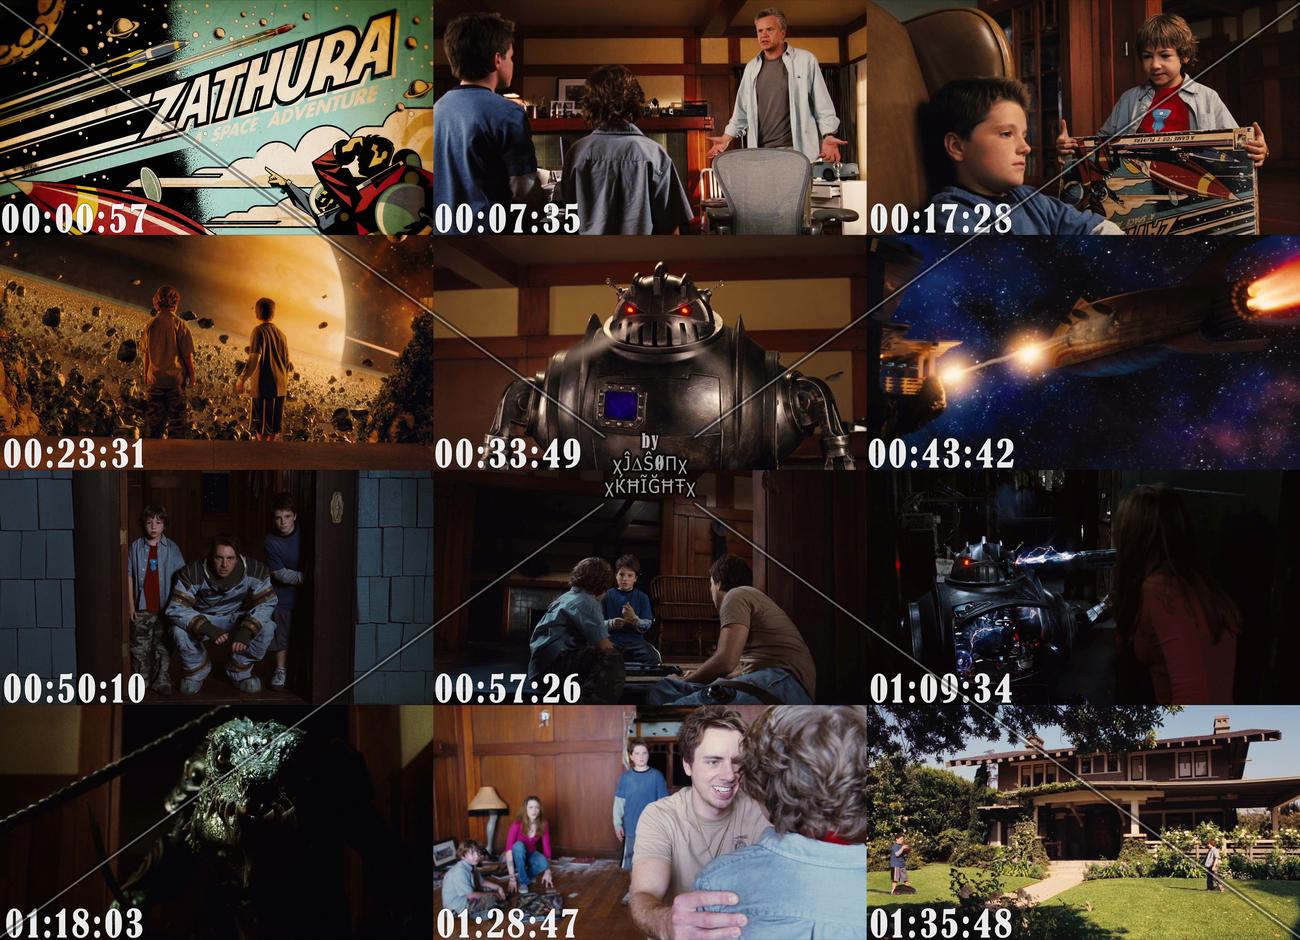 Descargar Jumanji Duology Zathura Hd 1080p Mega Español Latino